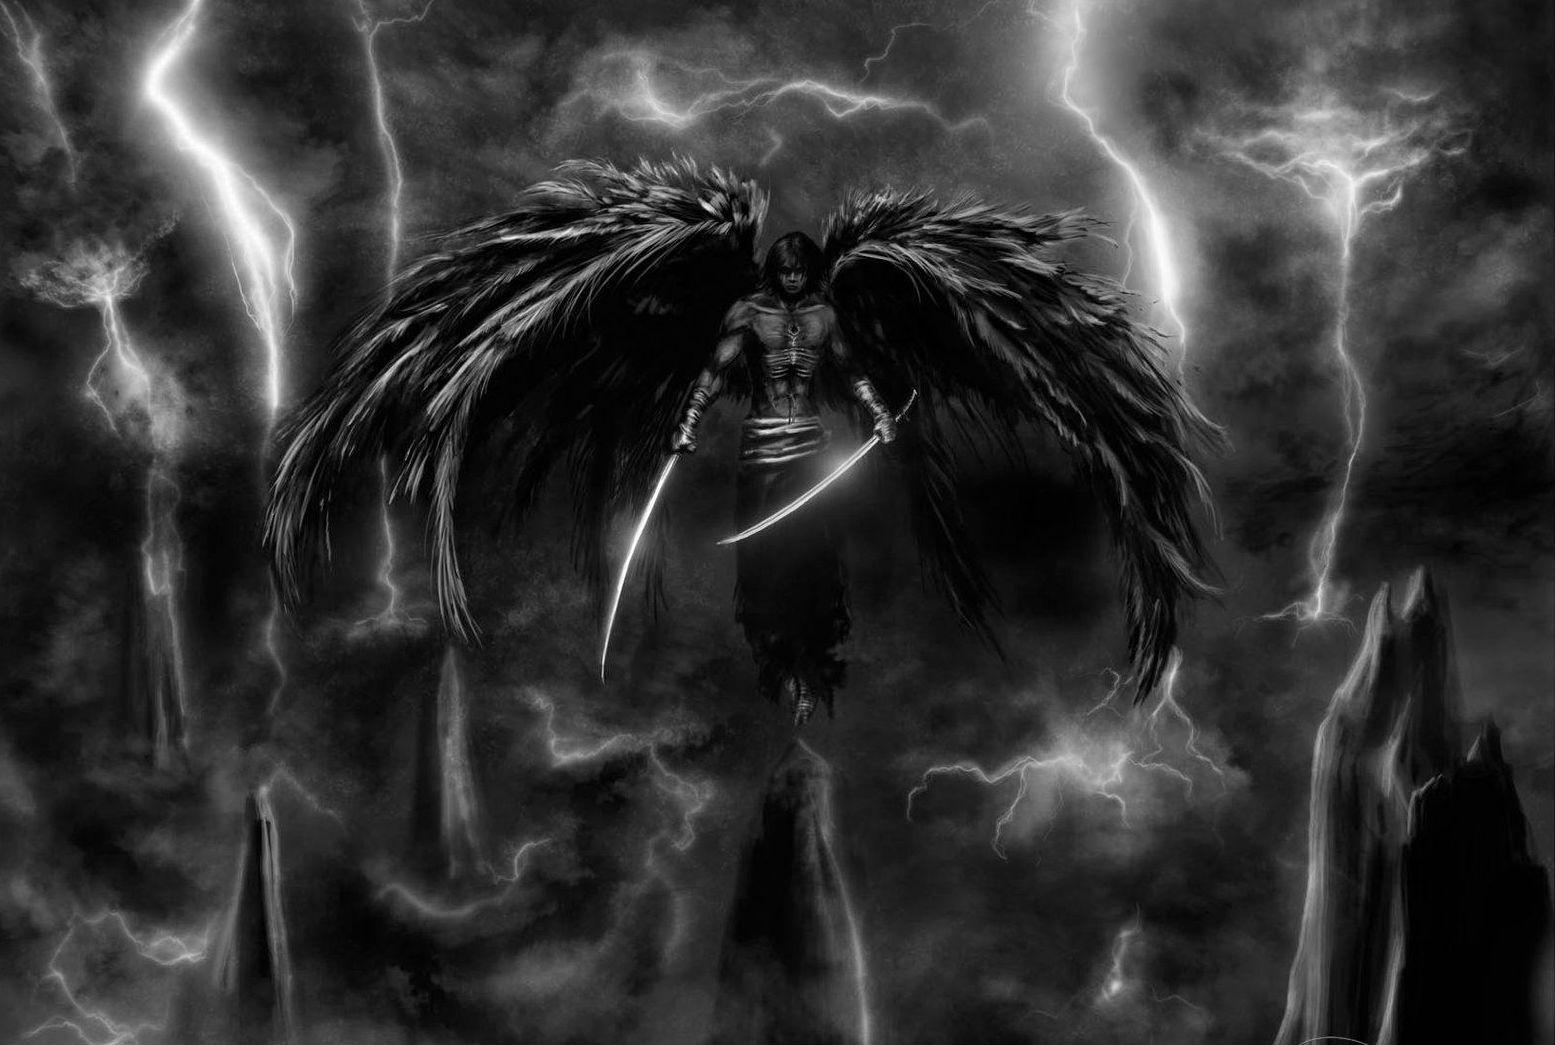 dark-angels-bunty-labels-animated-hd-dark-desktop-wallpaper-wpc9004016